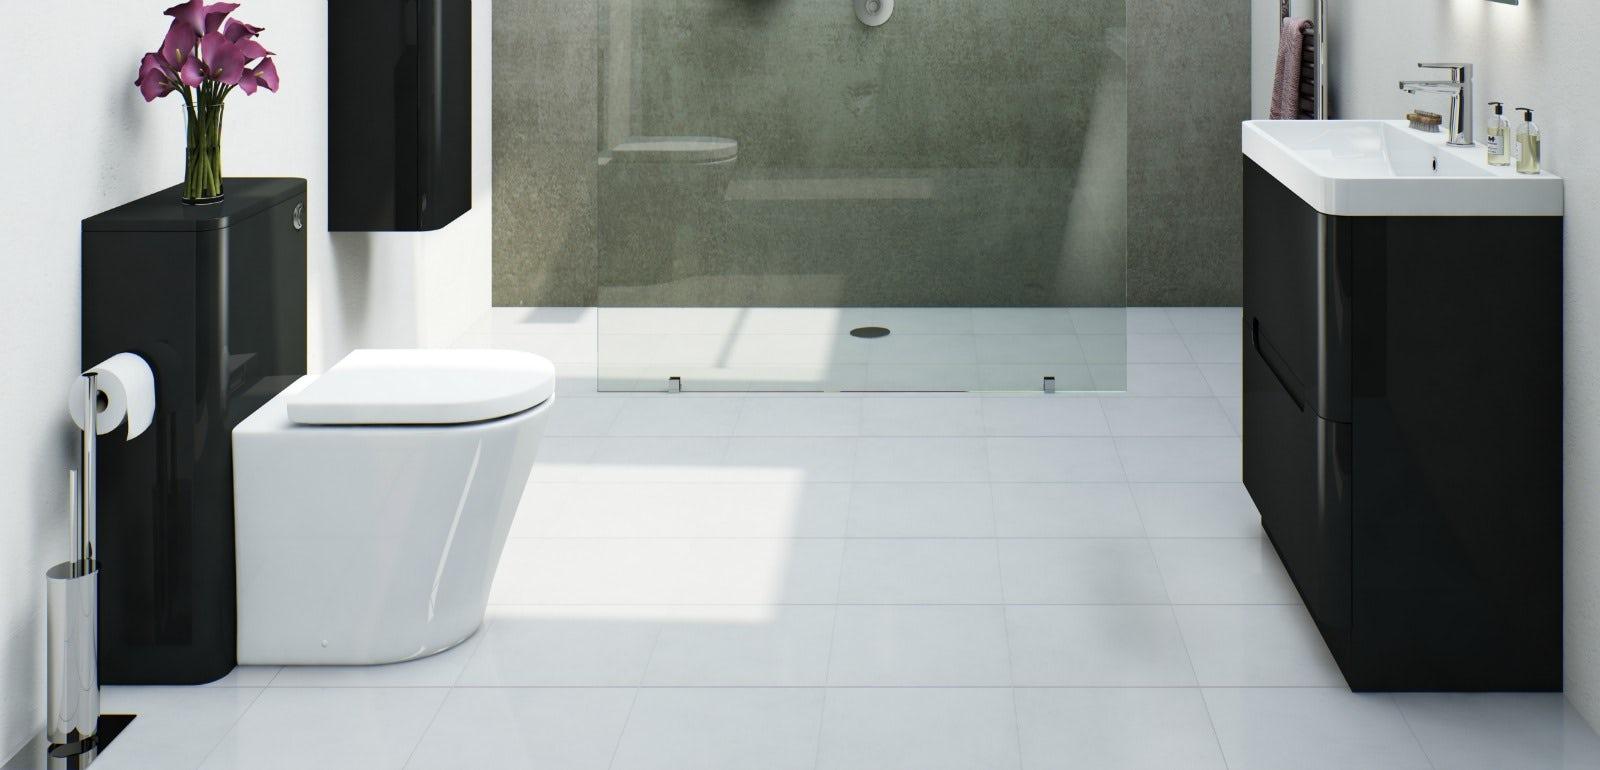 Contemporary bathroom inspiration gallery